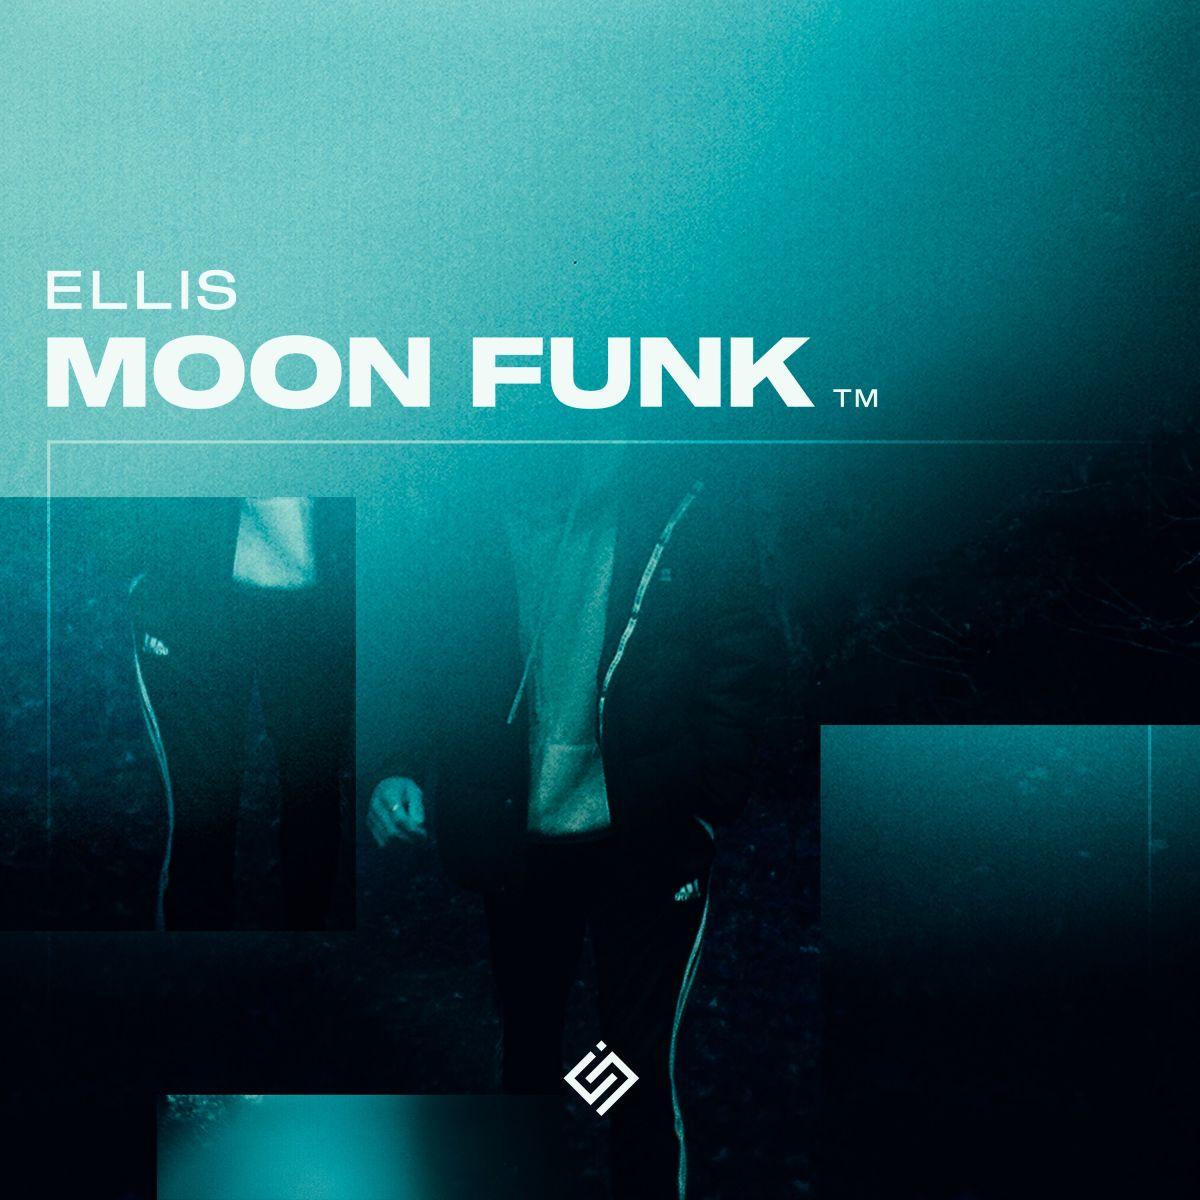 Ellis Moon Funk Album Art